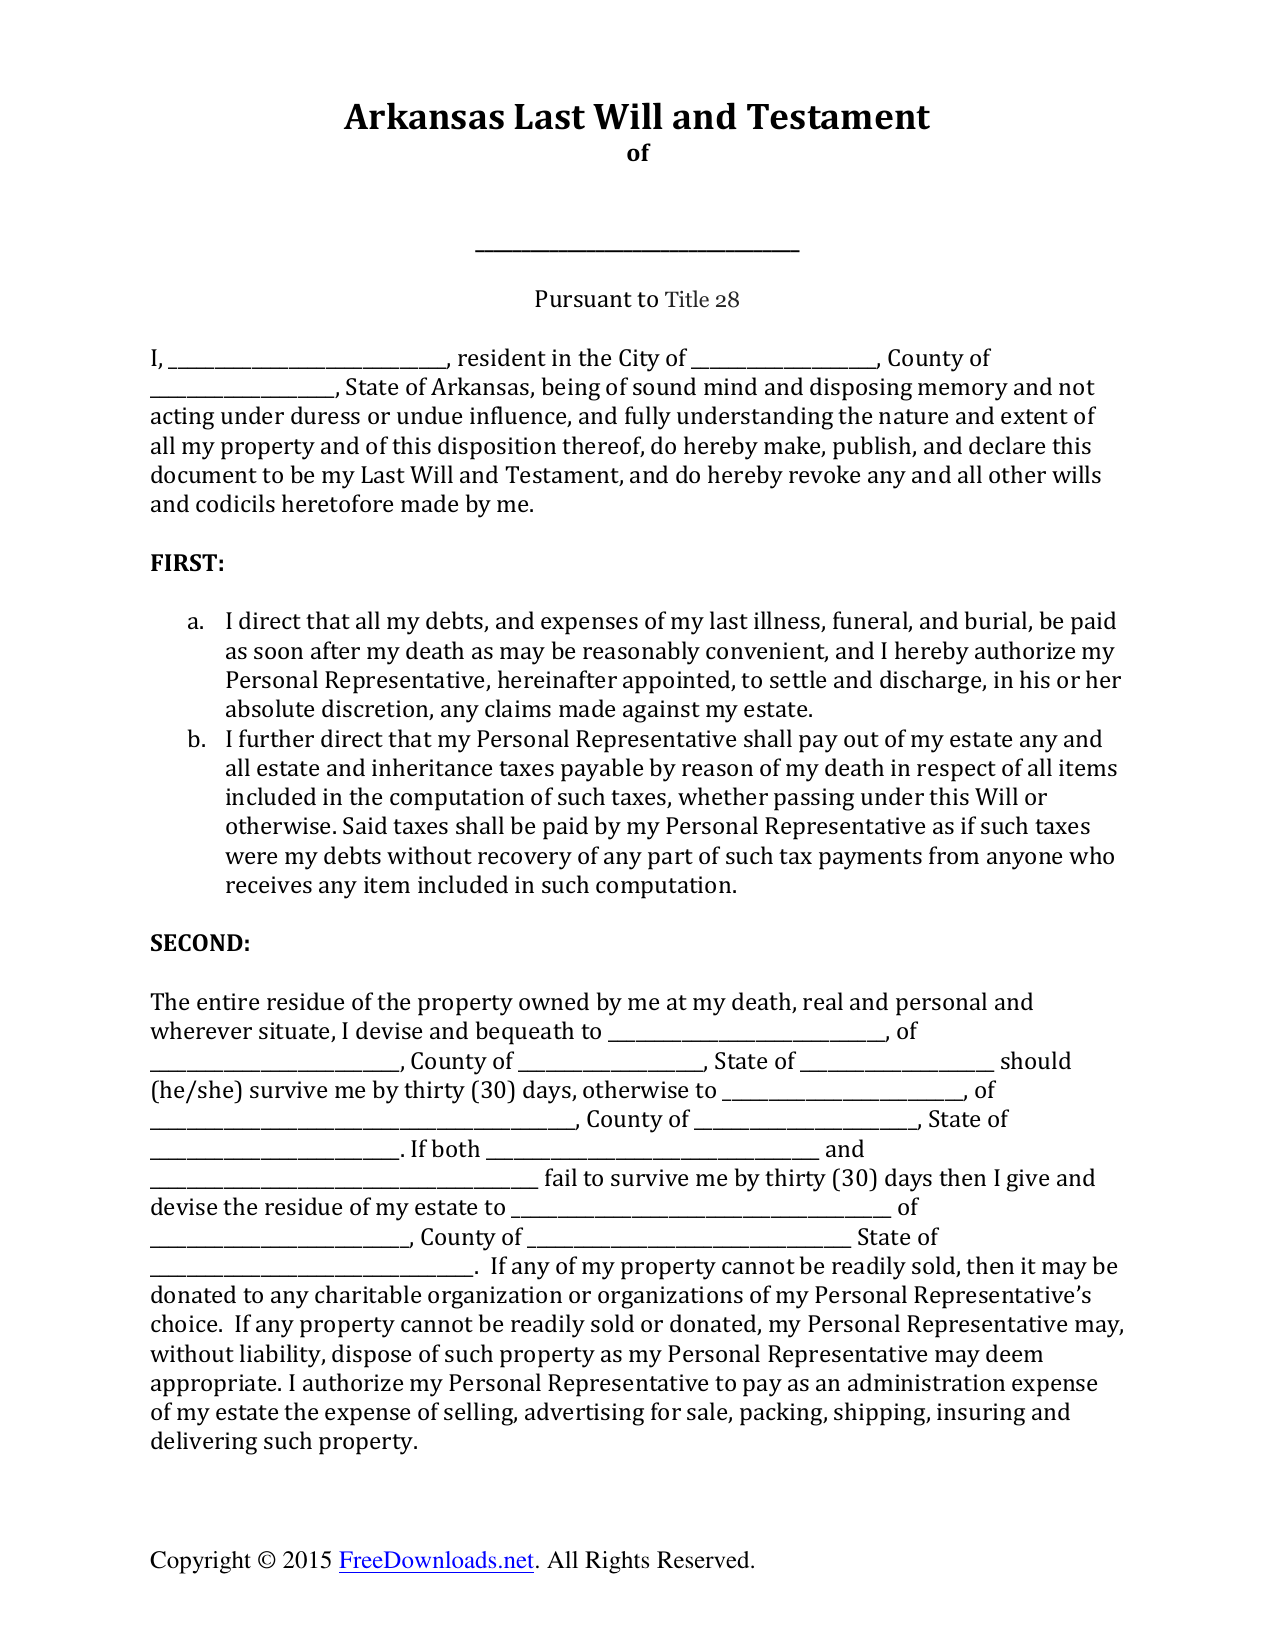 Download Arkansas Last Will And Testament Form Pdf Rtf